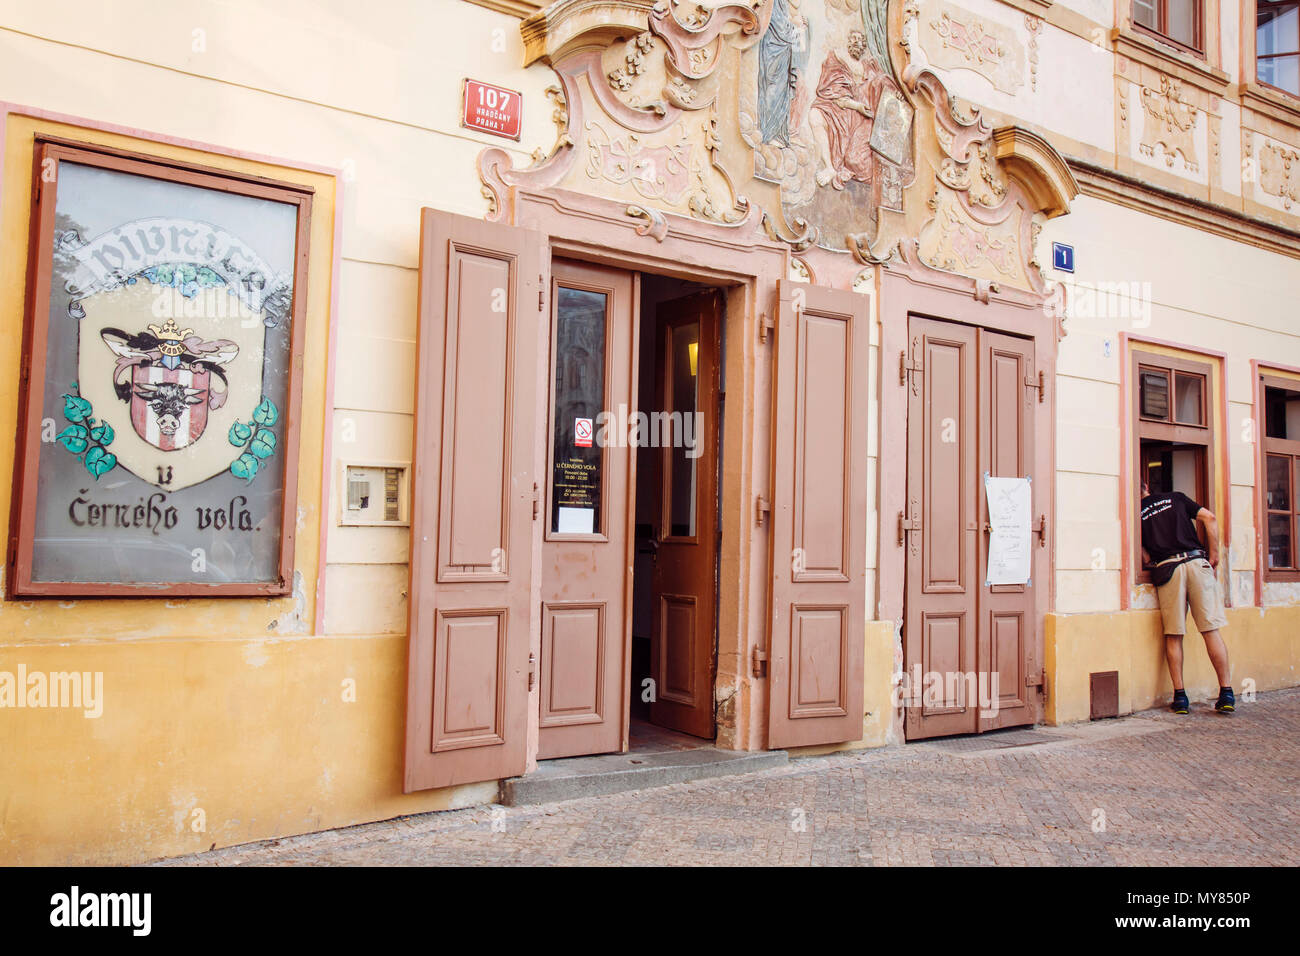 Prague, Czech republic, May 26, 2018: Traditional Pub U cerneho vola at Prague Castle area - Stock Image